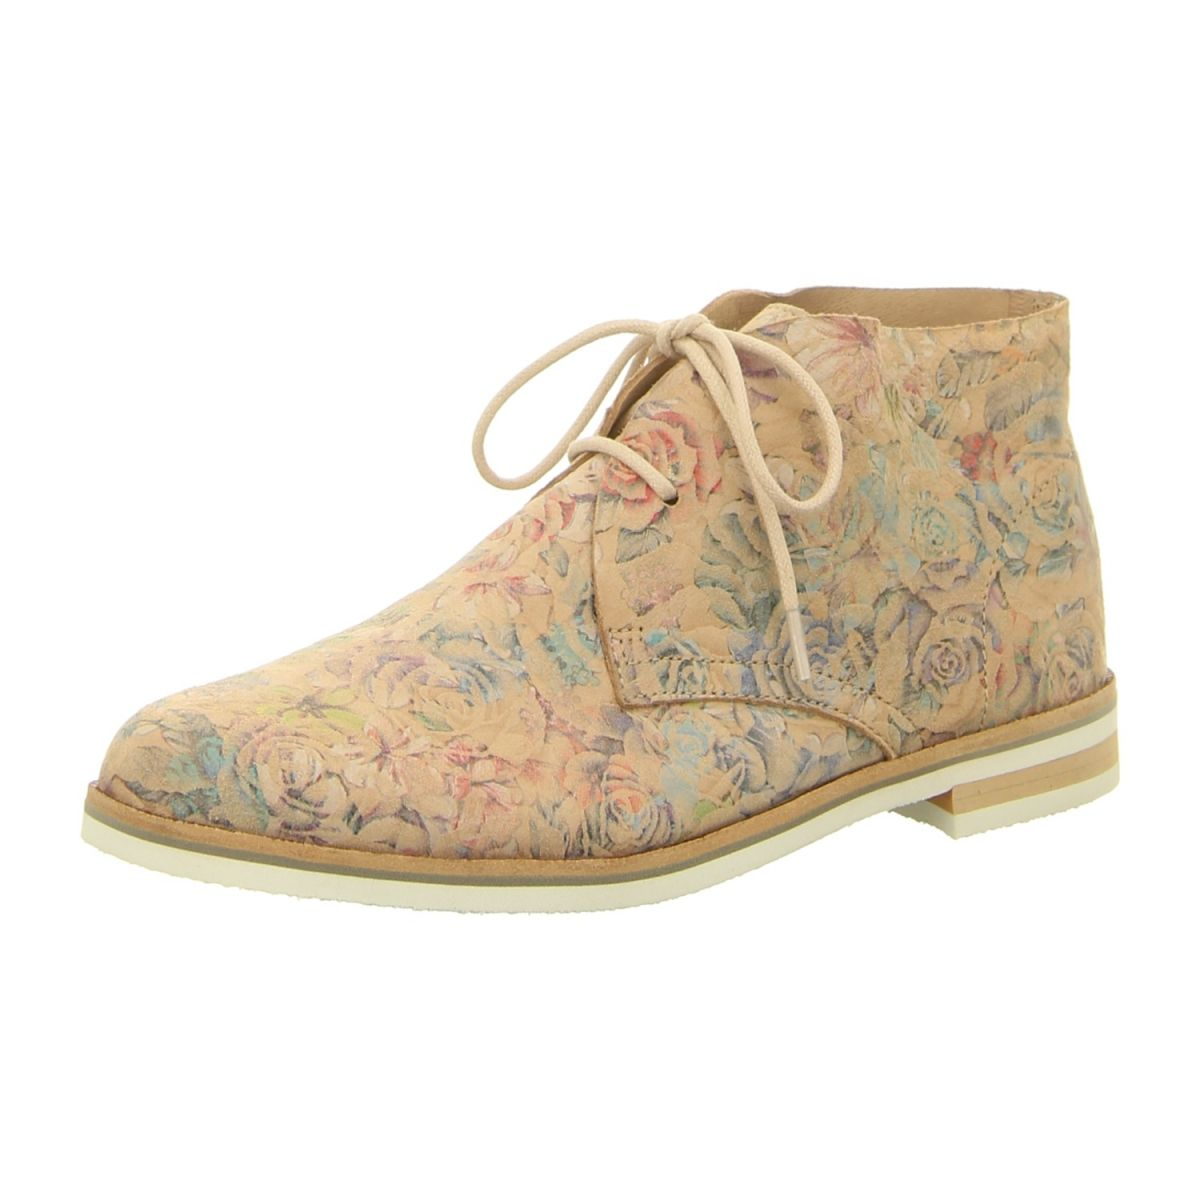 Caprice  zapatos  Stiefelette 9-9-25100-20-490 beige flow mul mul flow (beige) NEU 78cd4b